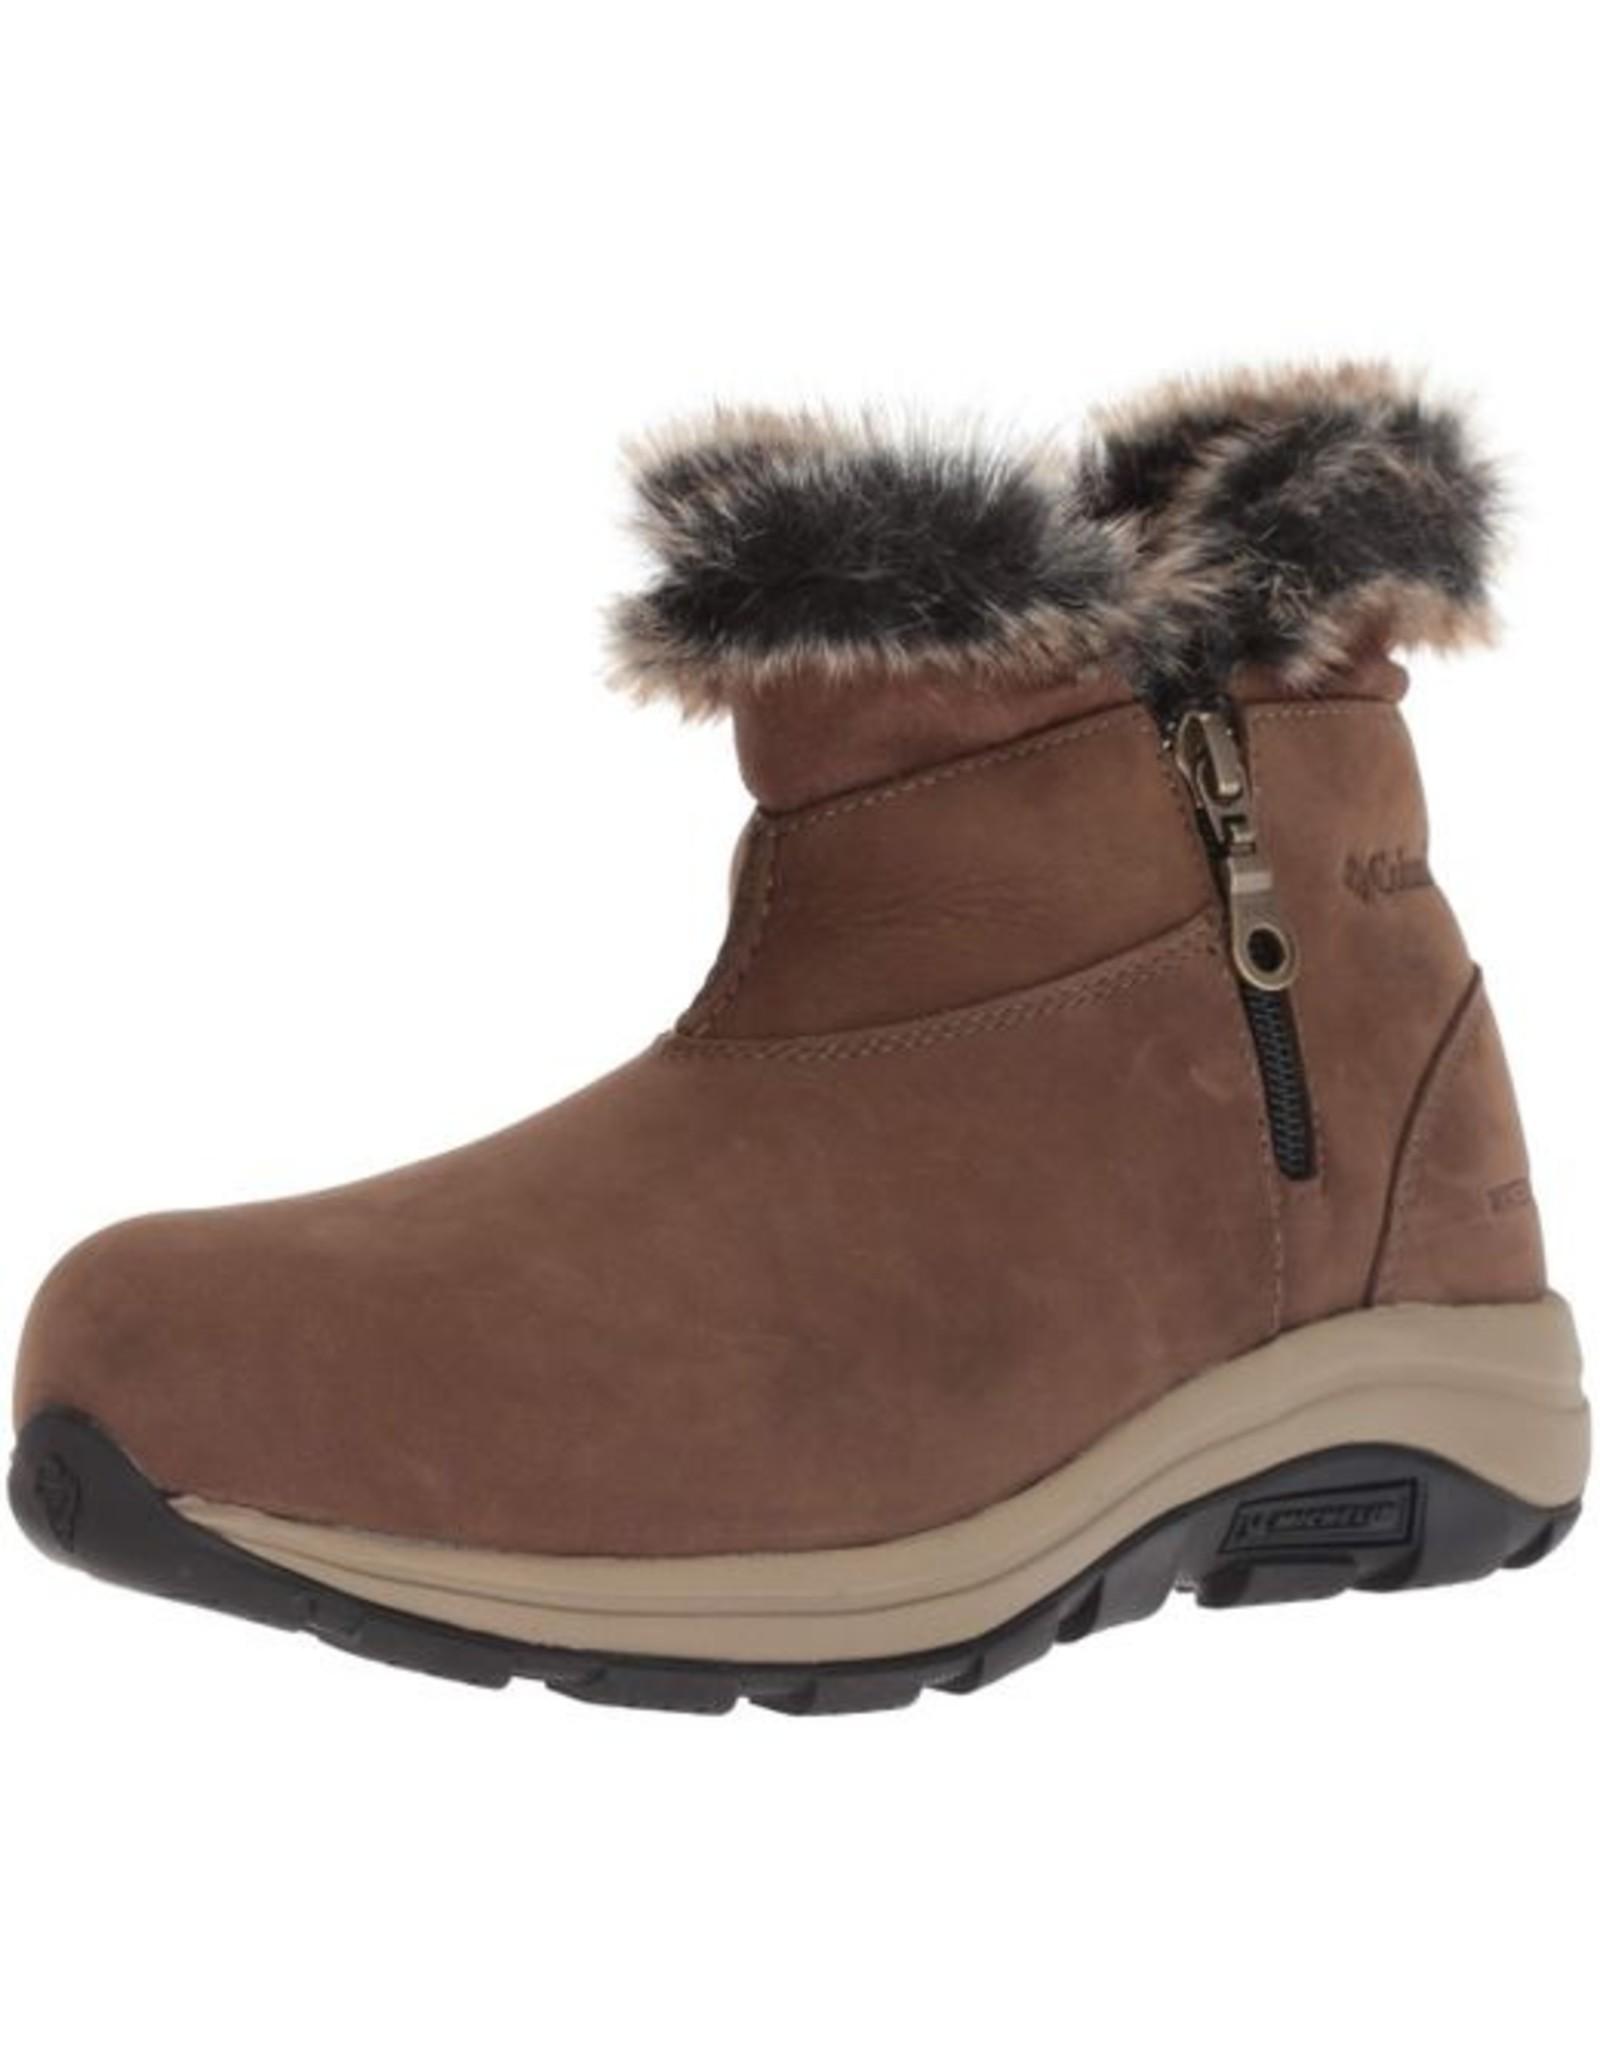 Columbia Columbia - Women's Bangor Shorty Omni-Heat Ankle Boot